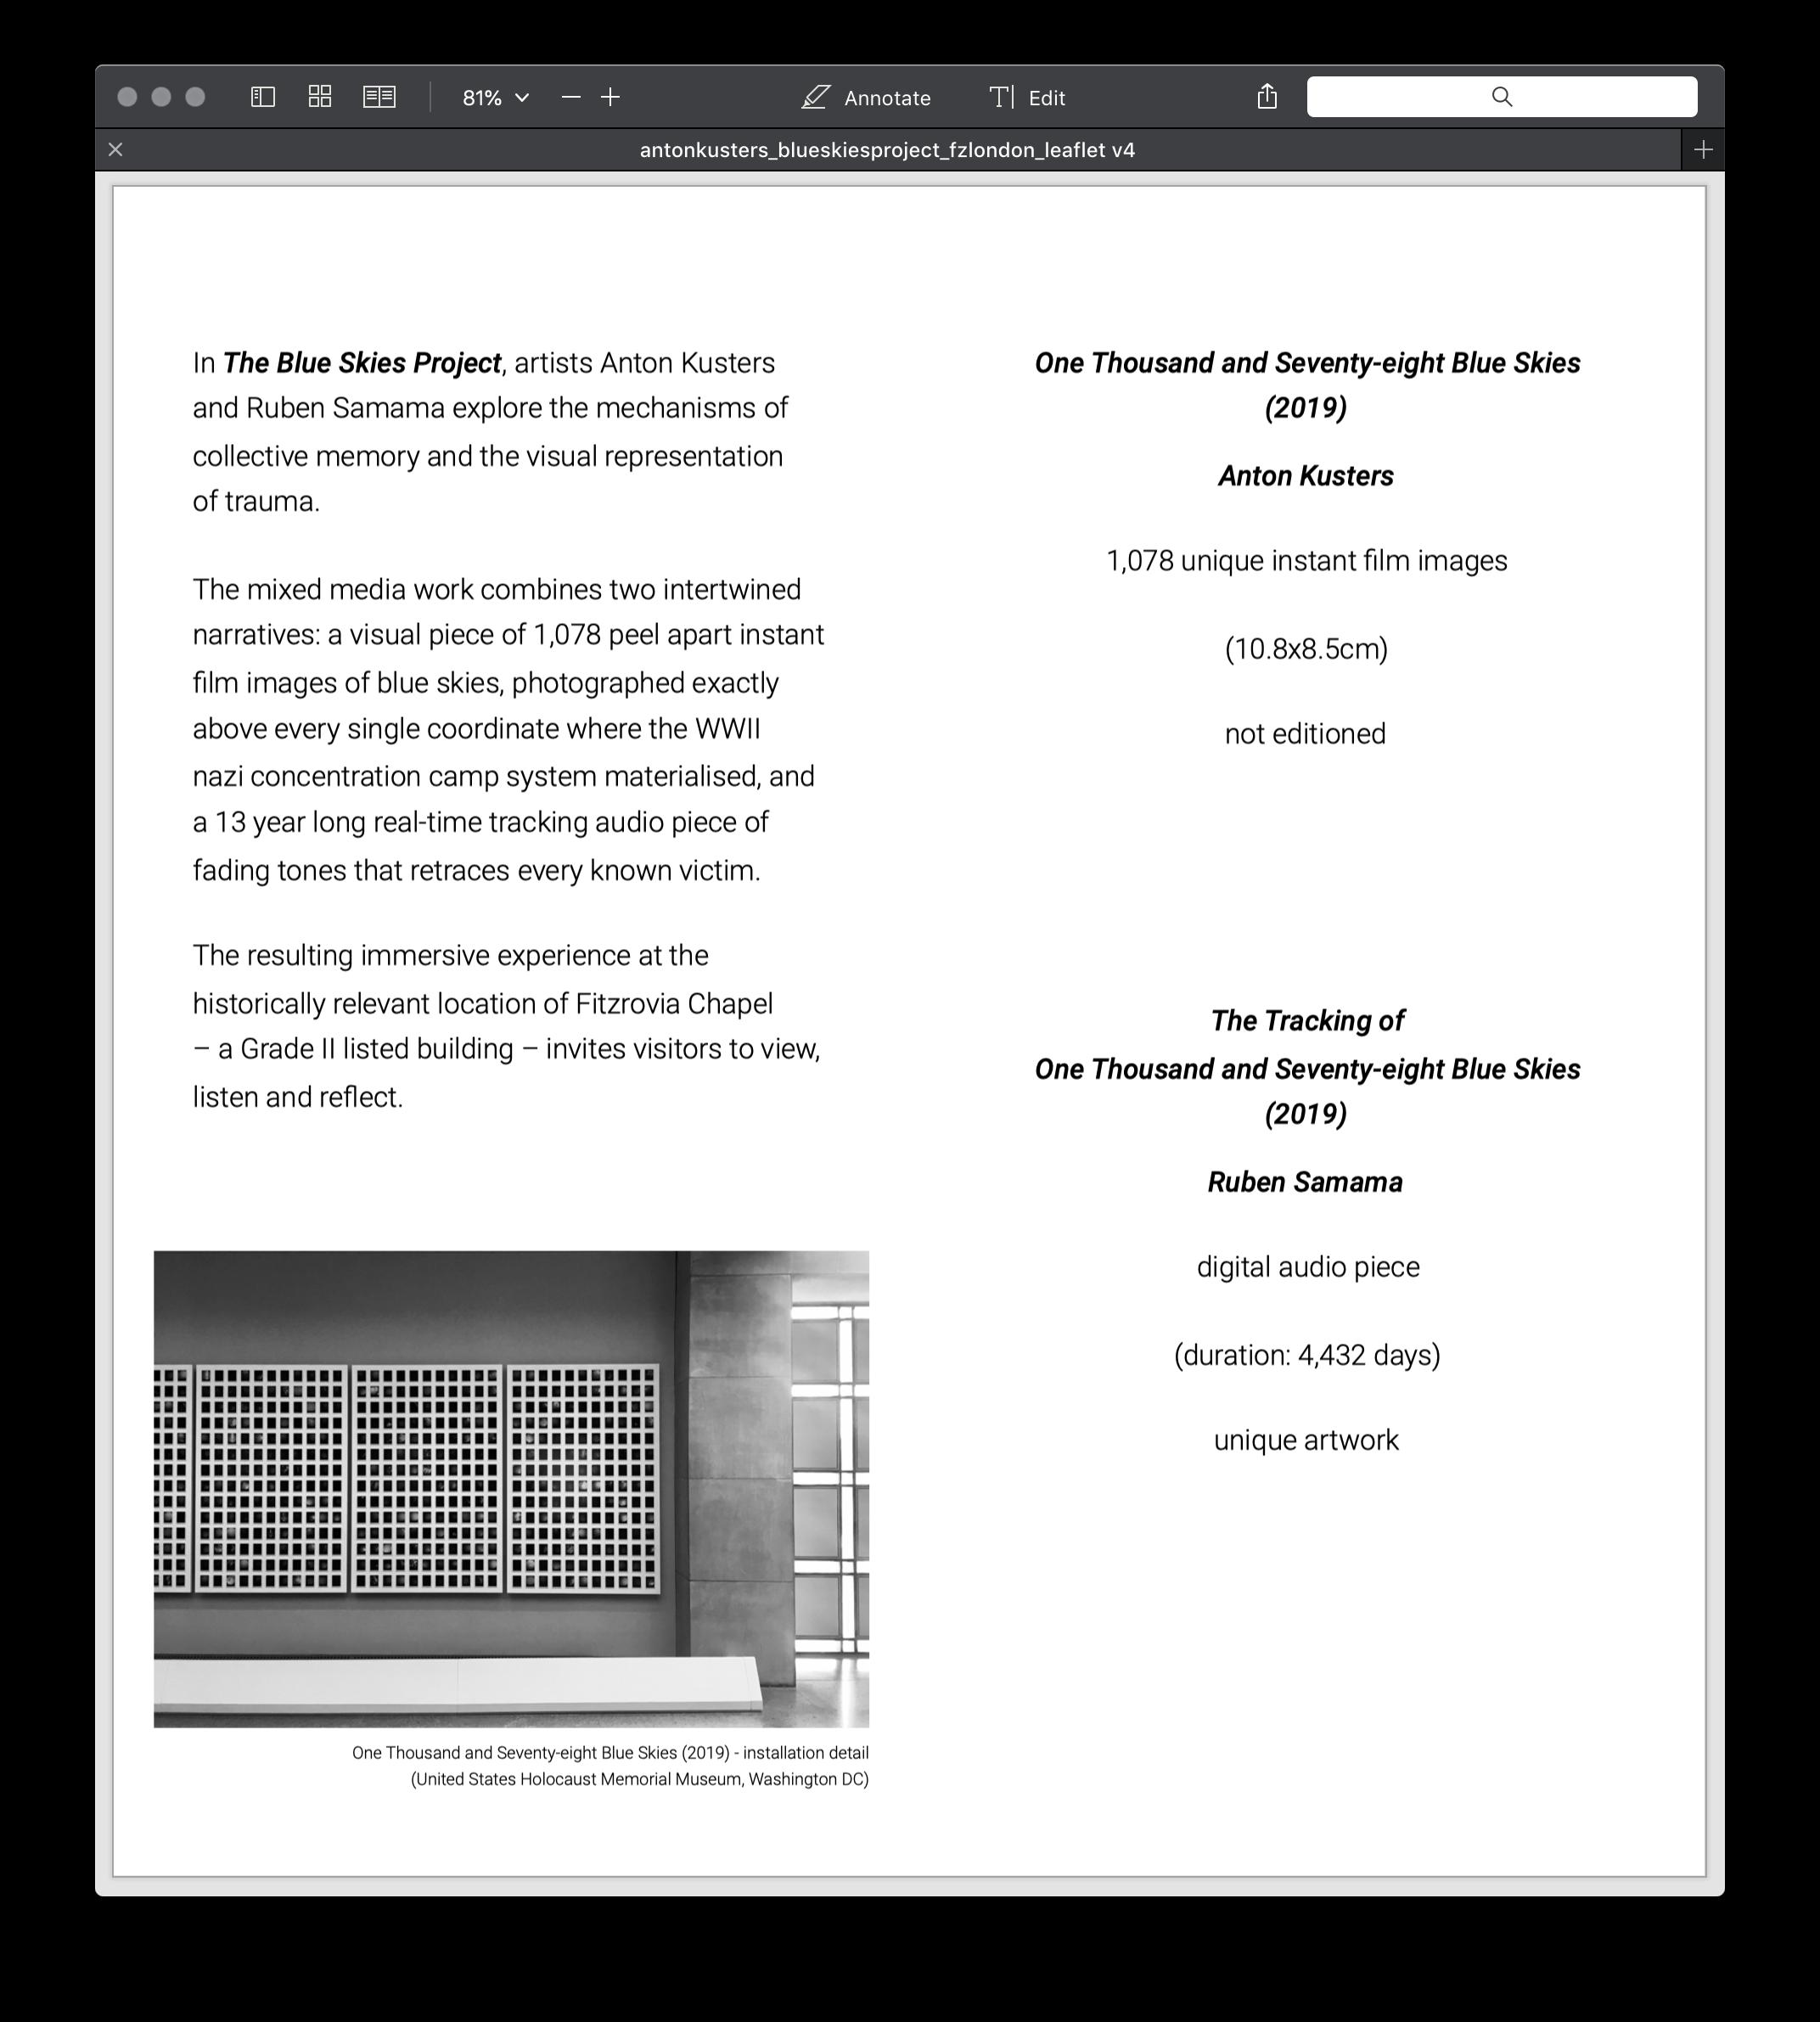 Screenshot 2019-05-22 14.24.39.png